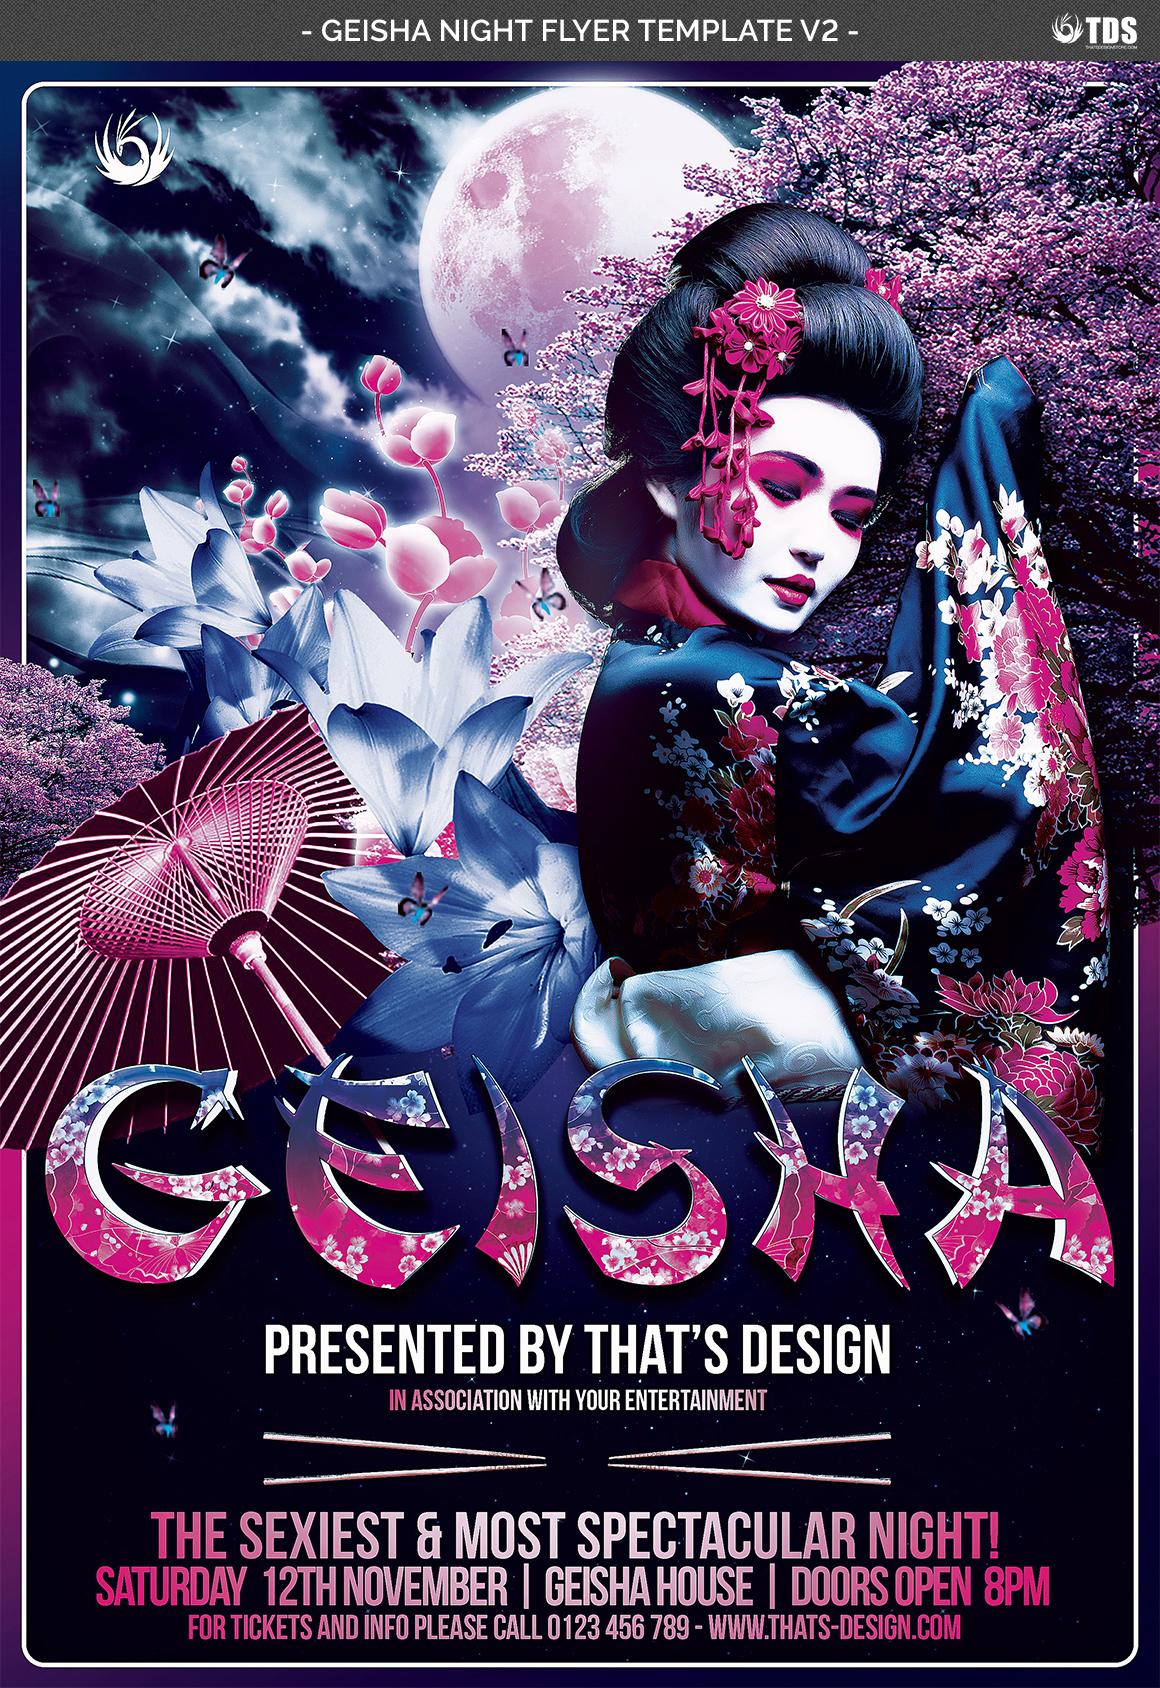 Geisha Night Flyer Template V2 example image 4